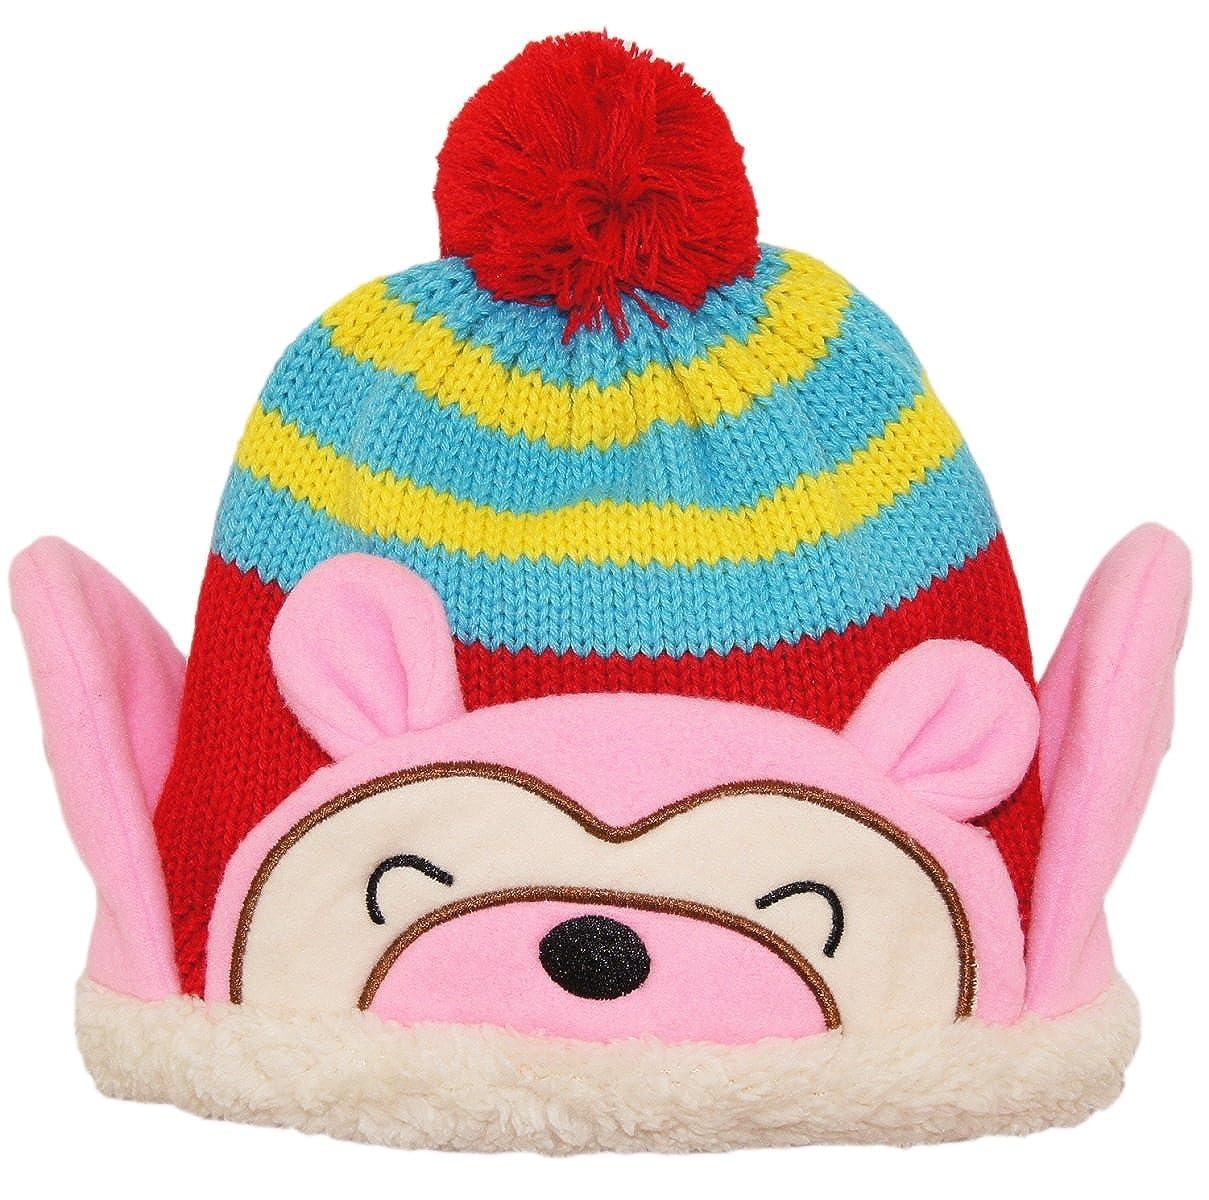 Wippette Little Girls Winter Polar Sweater Sherpa Lined Combo Hat Size 2-4T Blue Toddler